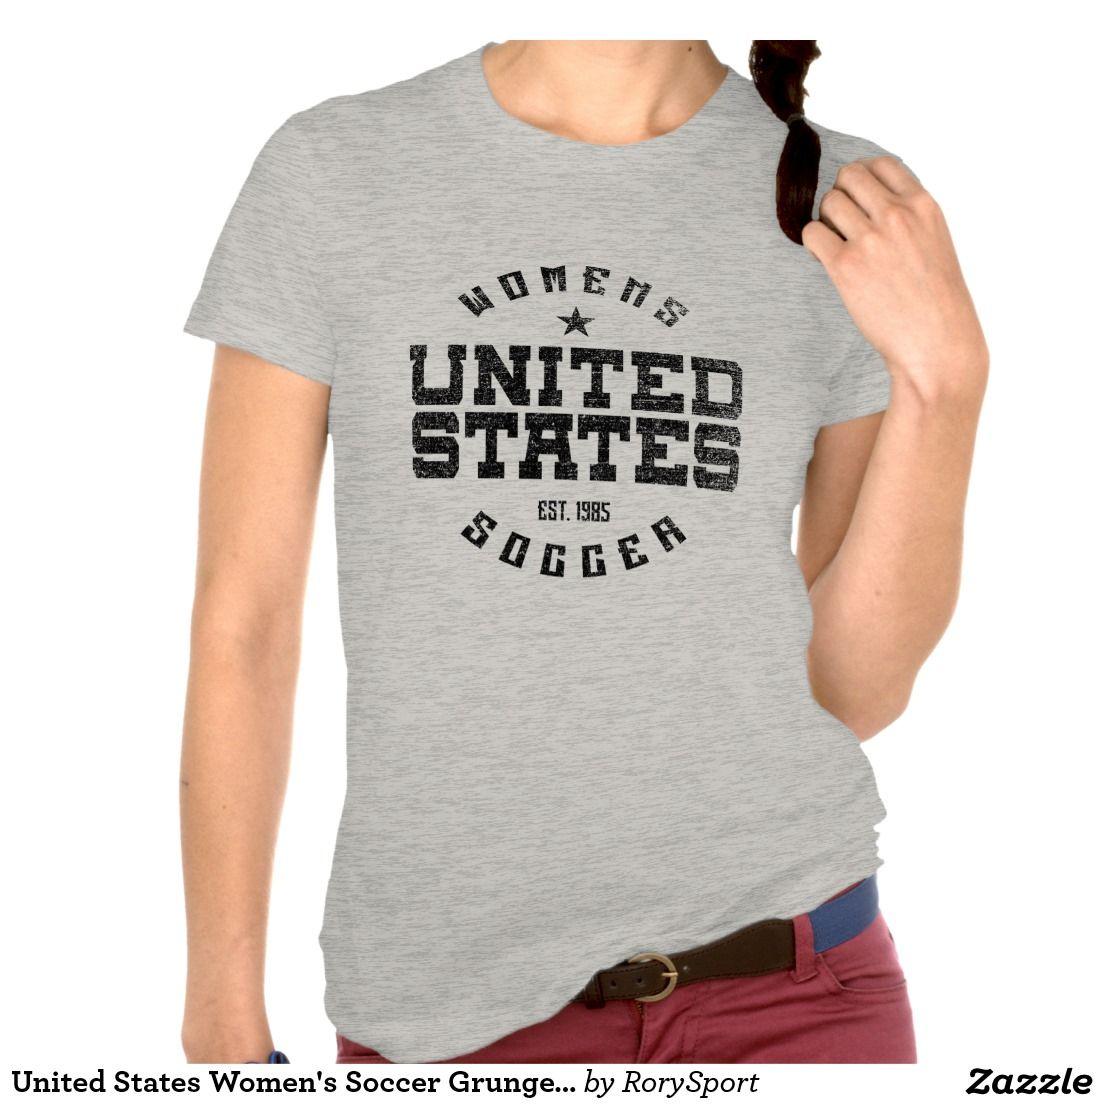 United States Women's Soccer Grunge T-Shirt